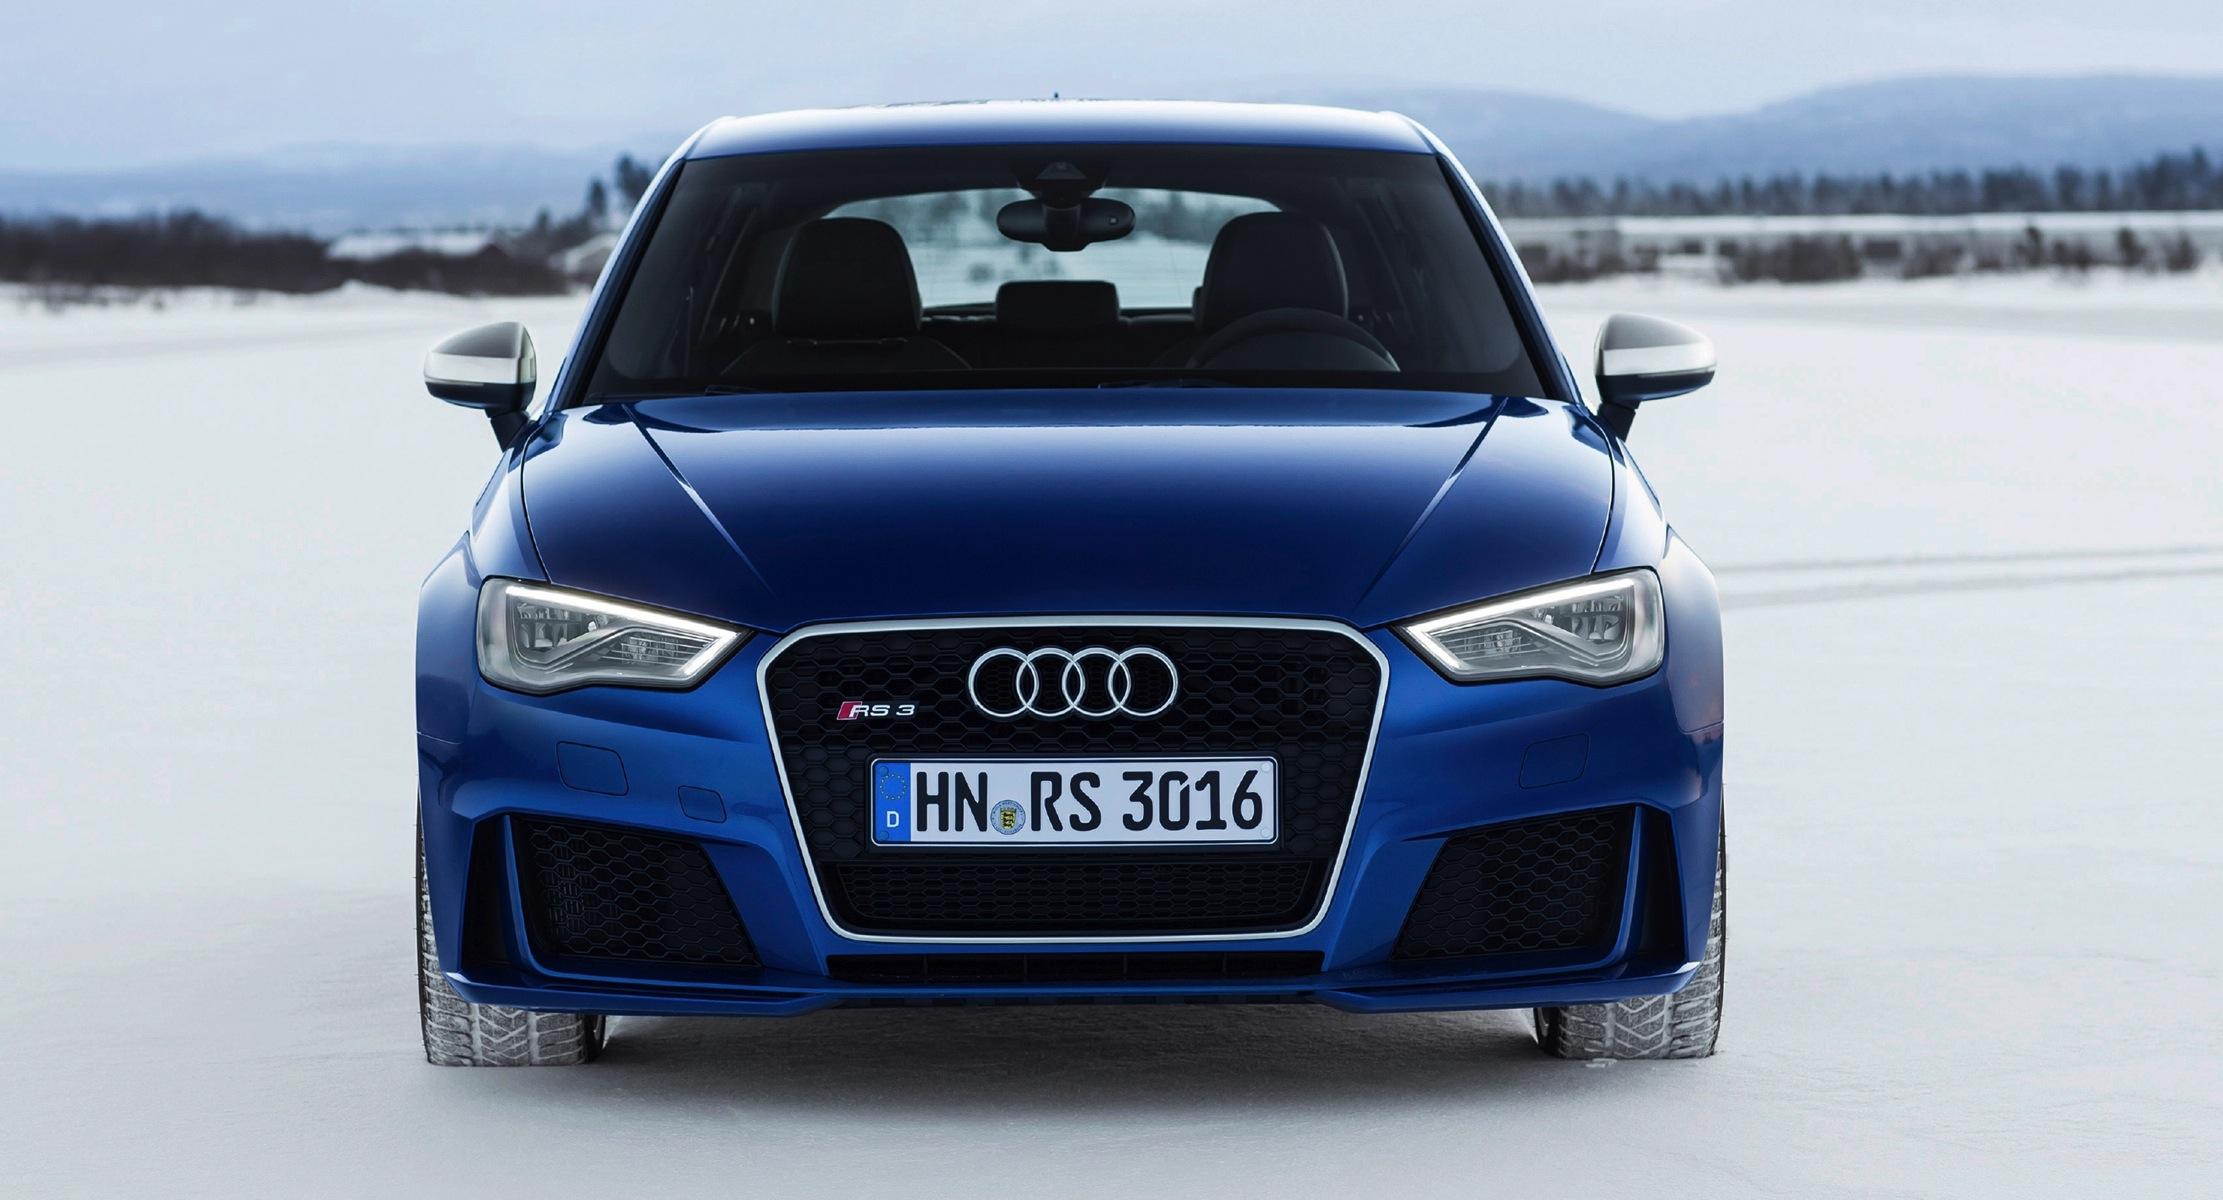 2015 Audi Rs3 New Photos Show Sepang Blue Color Autoevolution